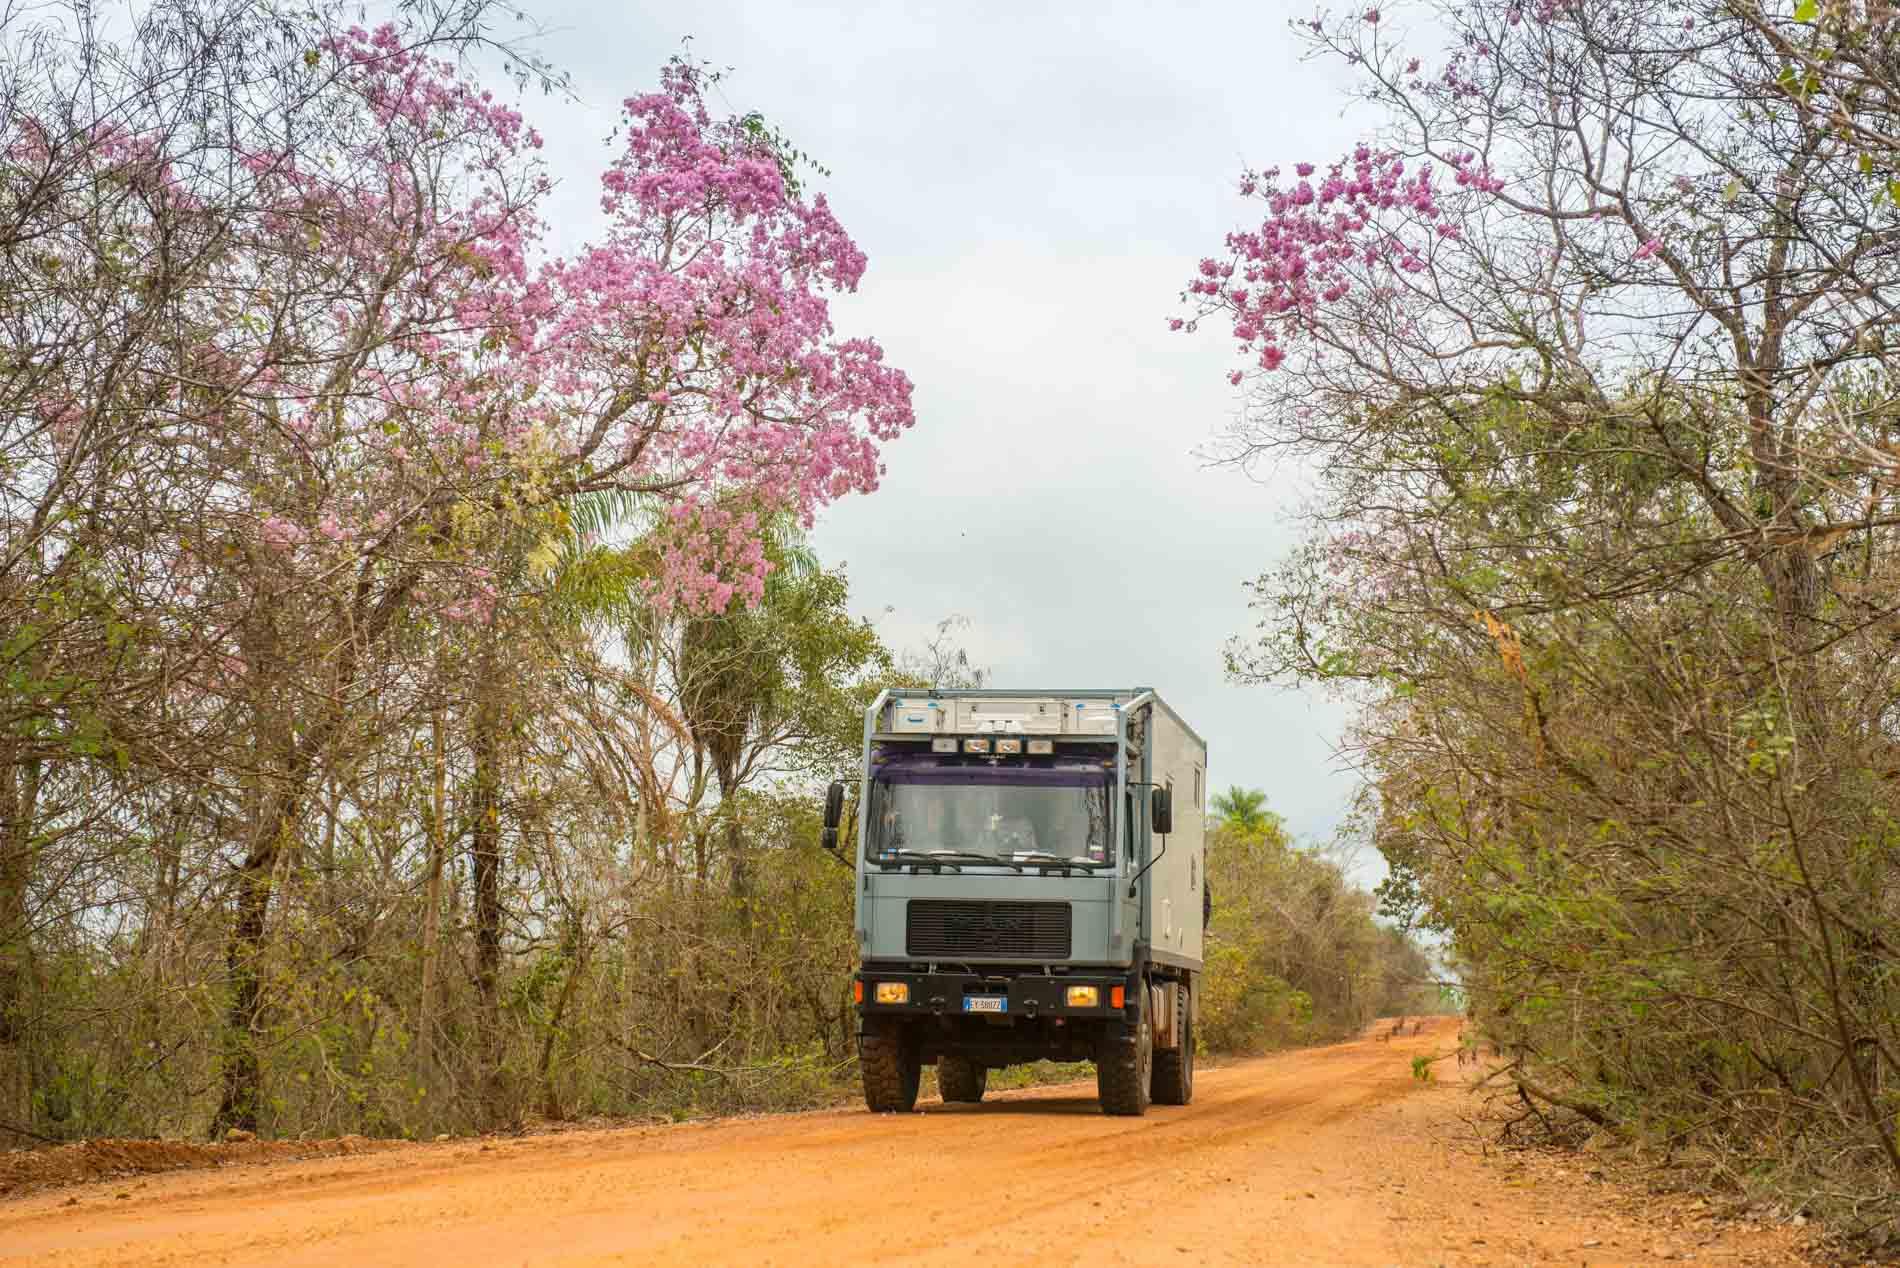 sud-pantanal-strada-sterrata